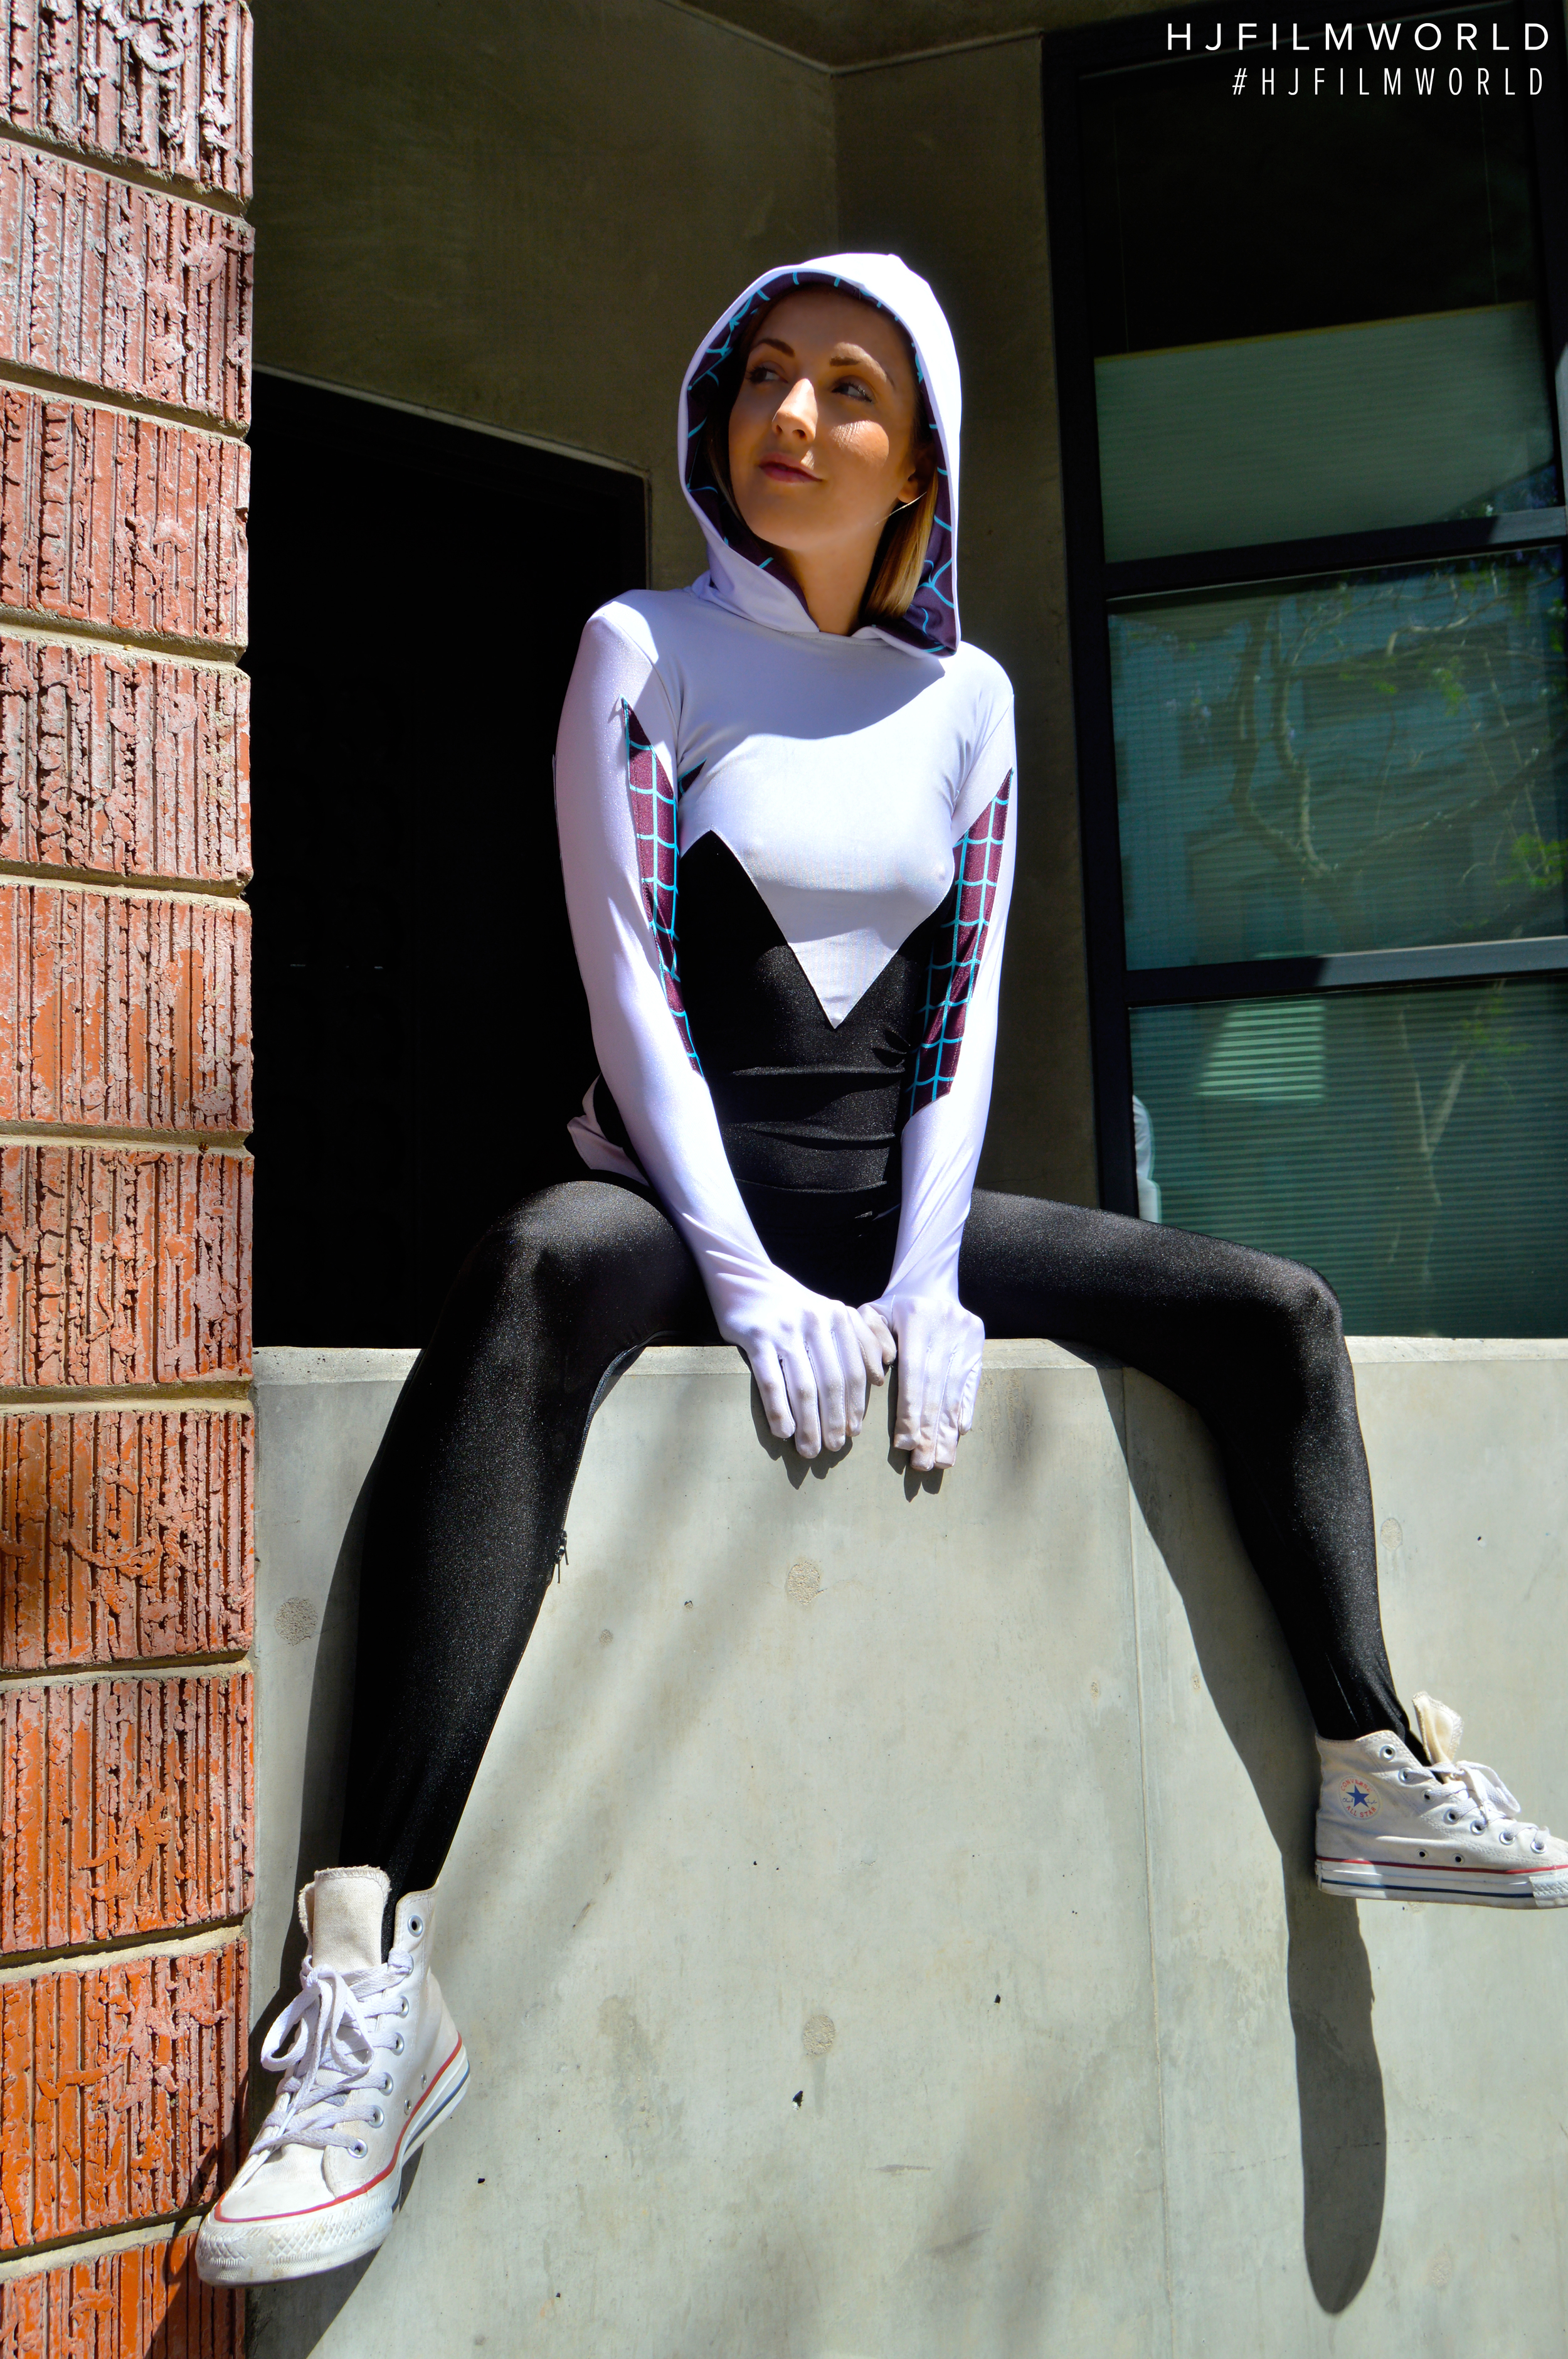 Model: Karla Kush